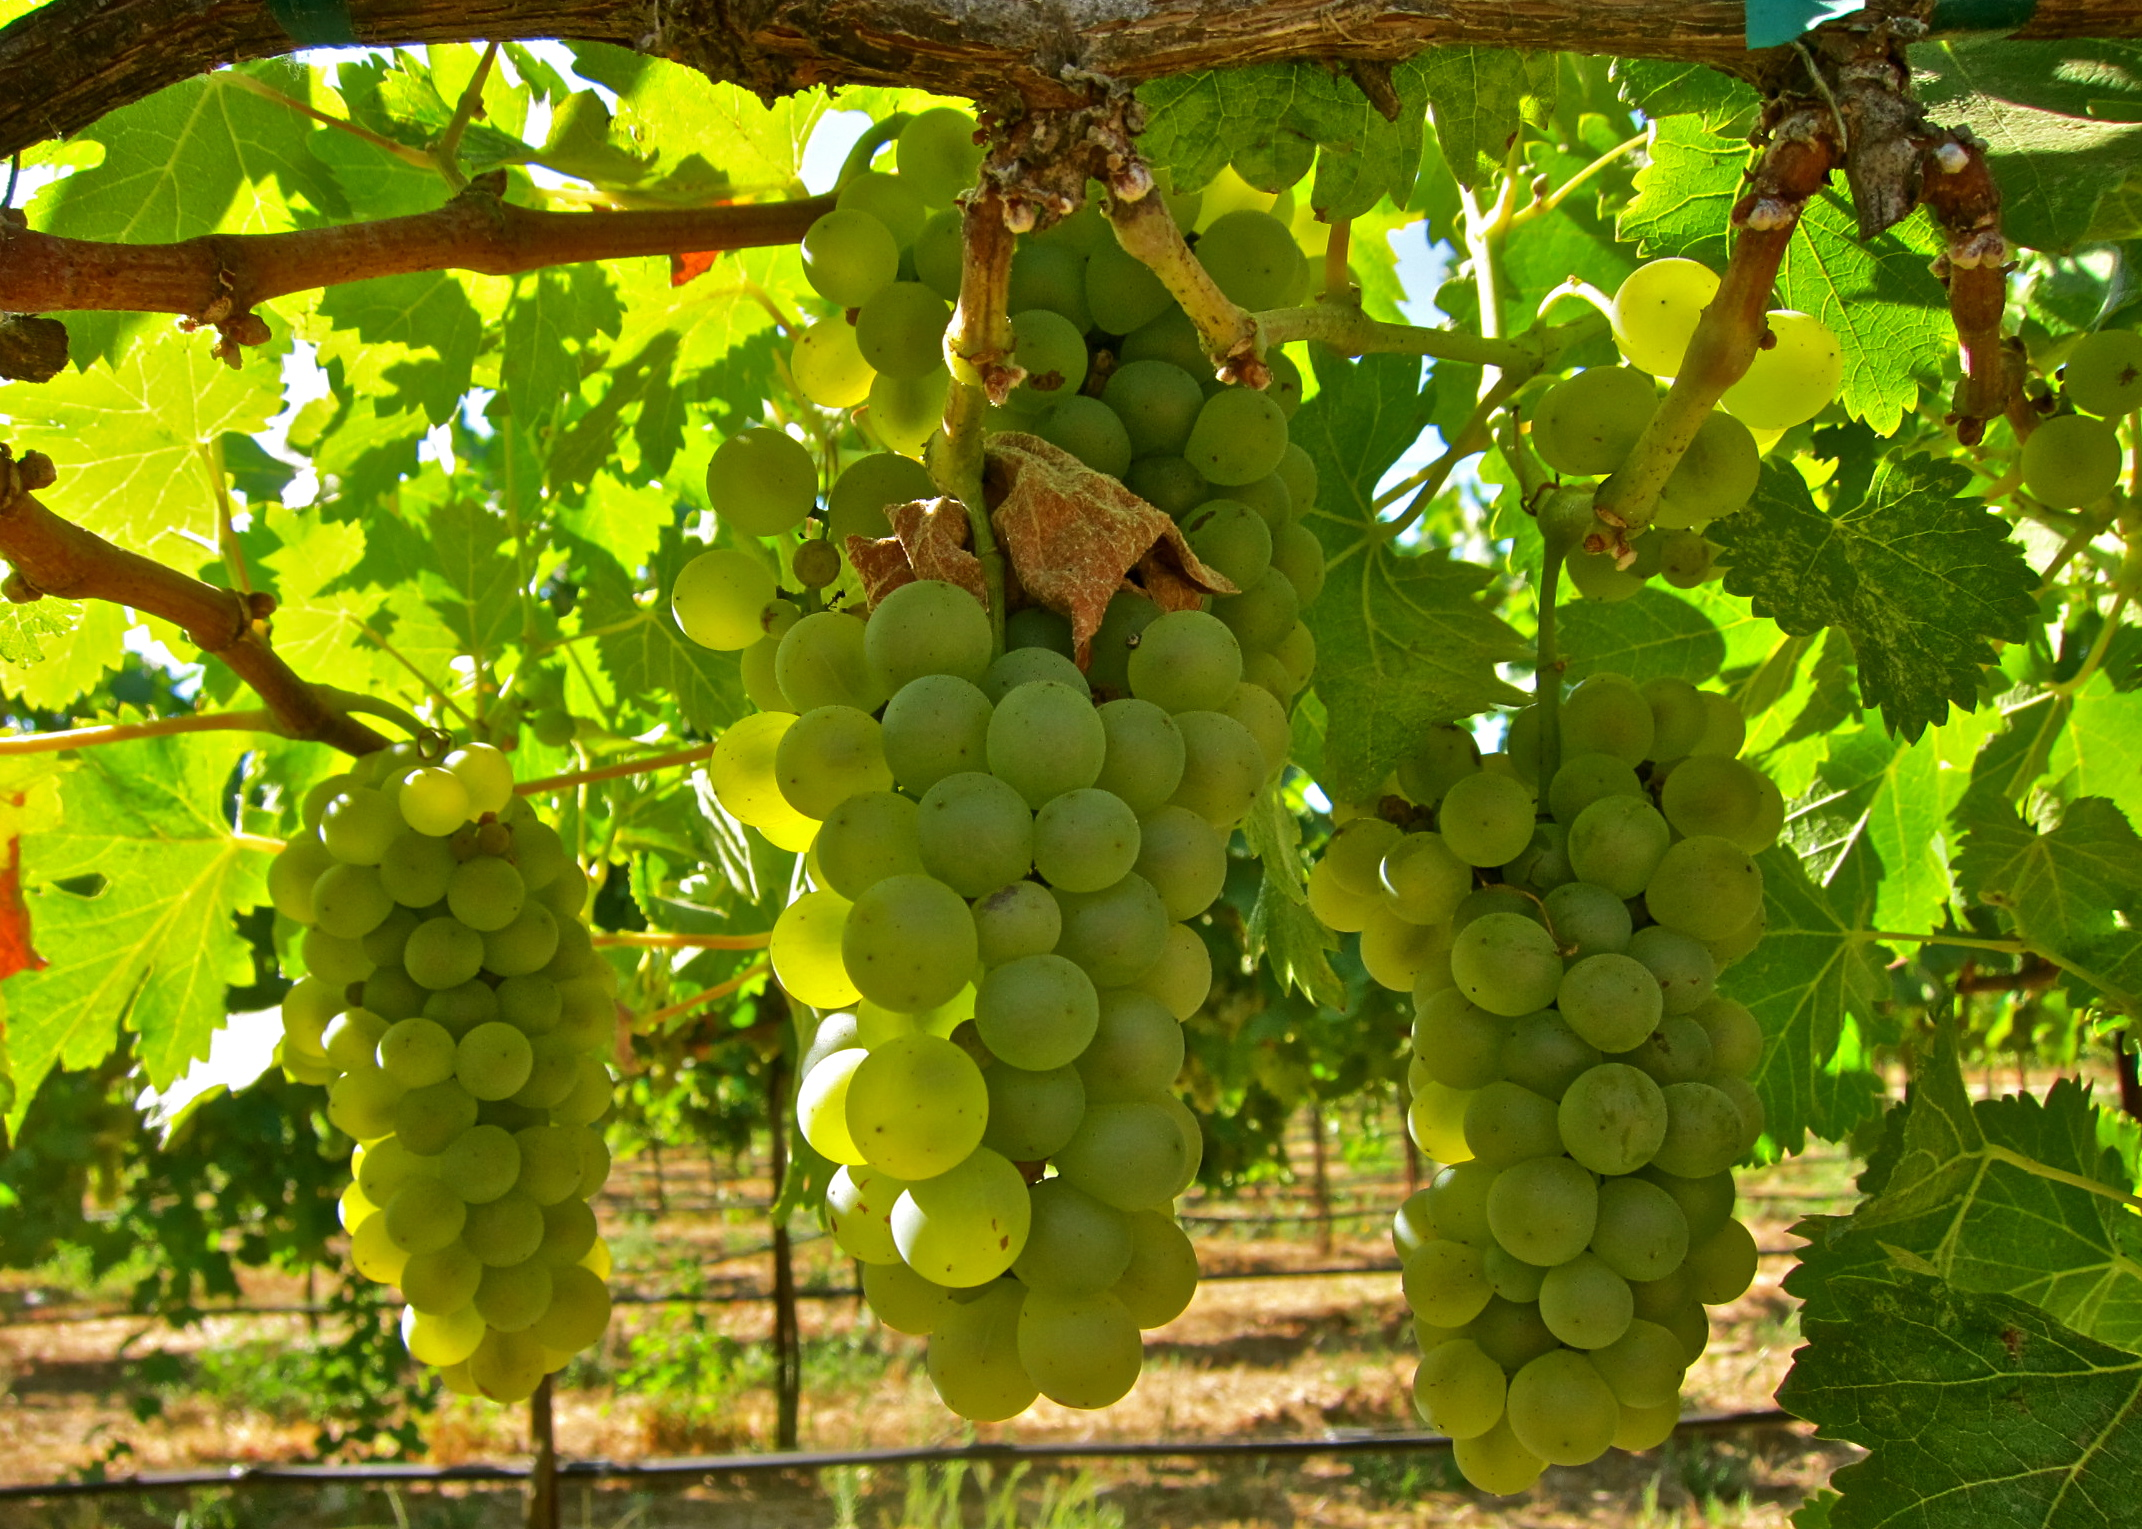 2014 Chardonnay grapes